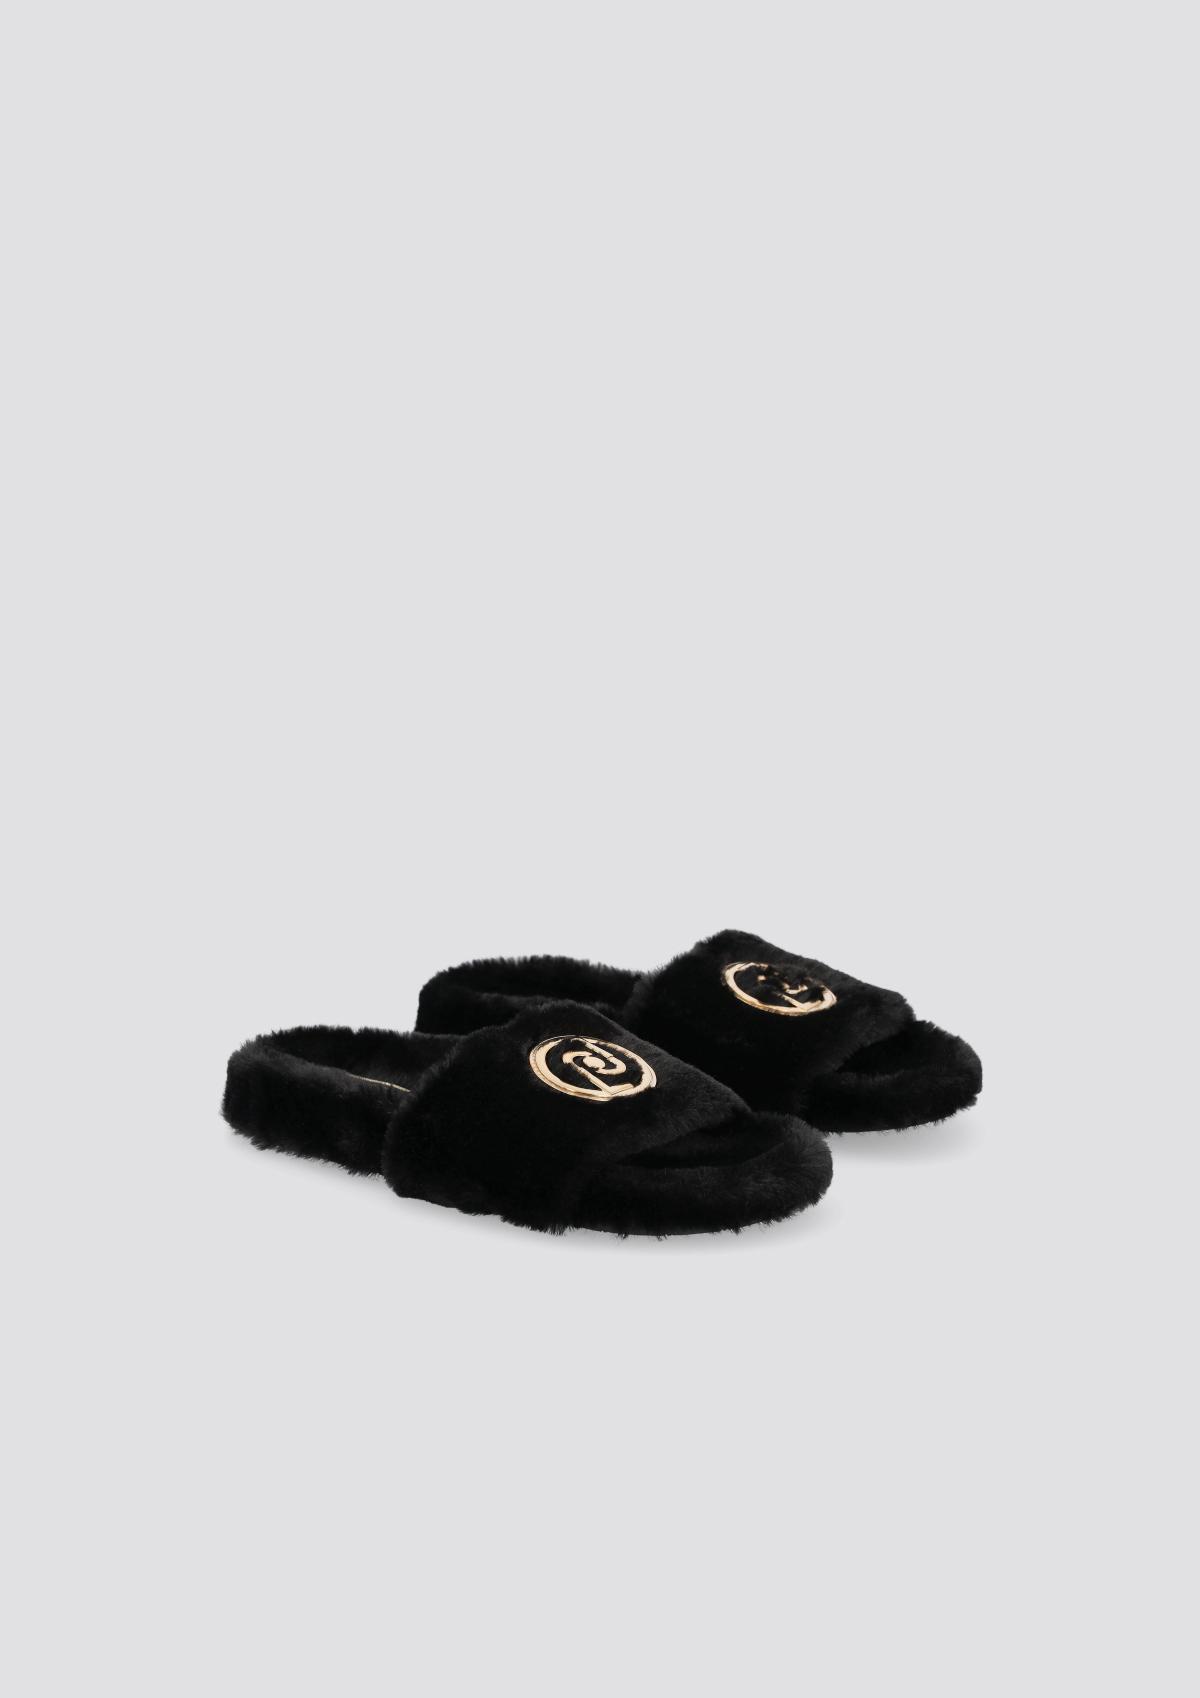 LIU.JO Black slippers in synthetic fabric BLACK new